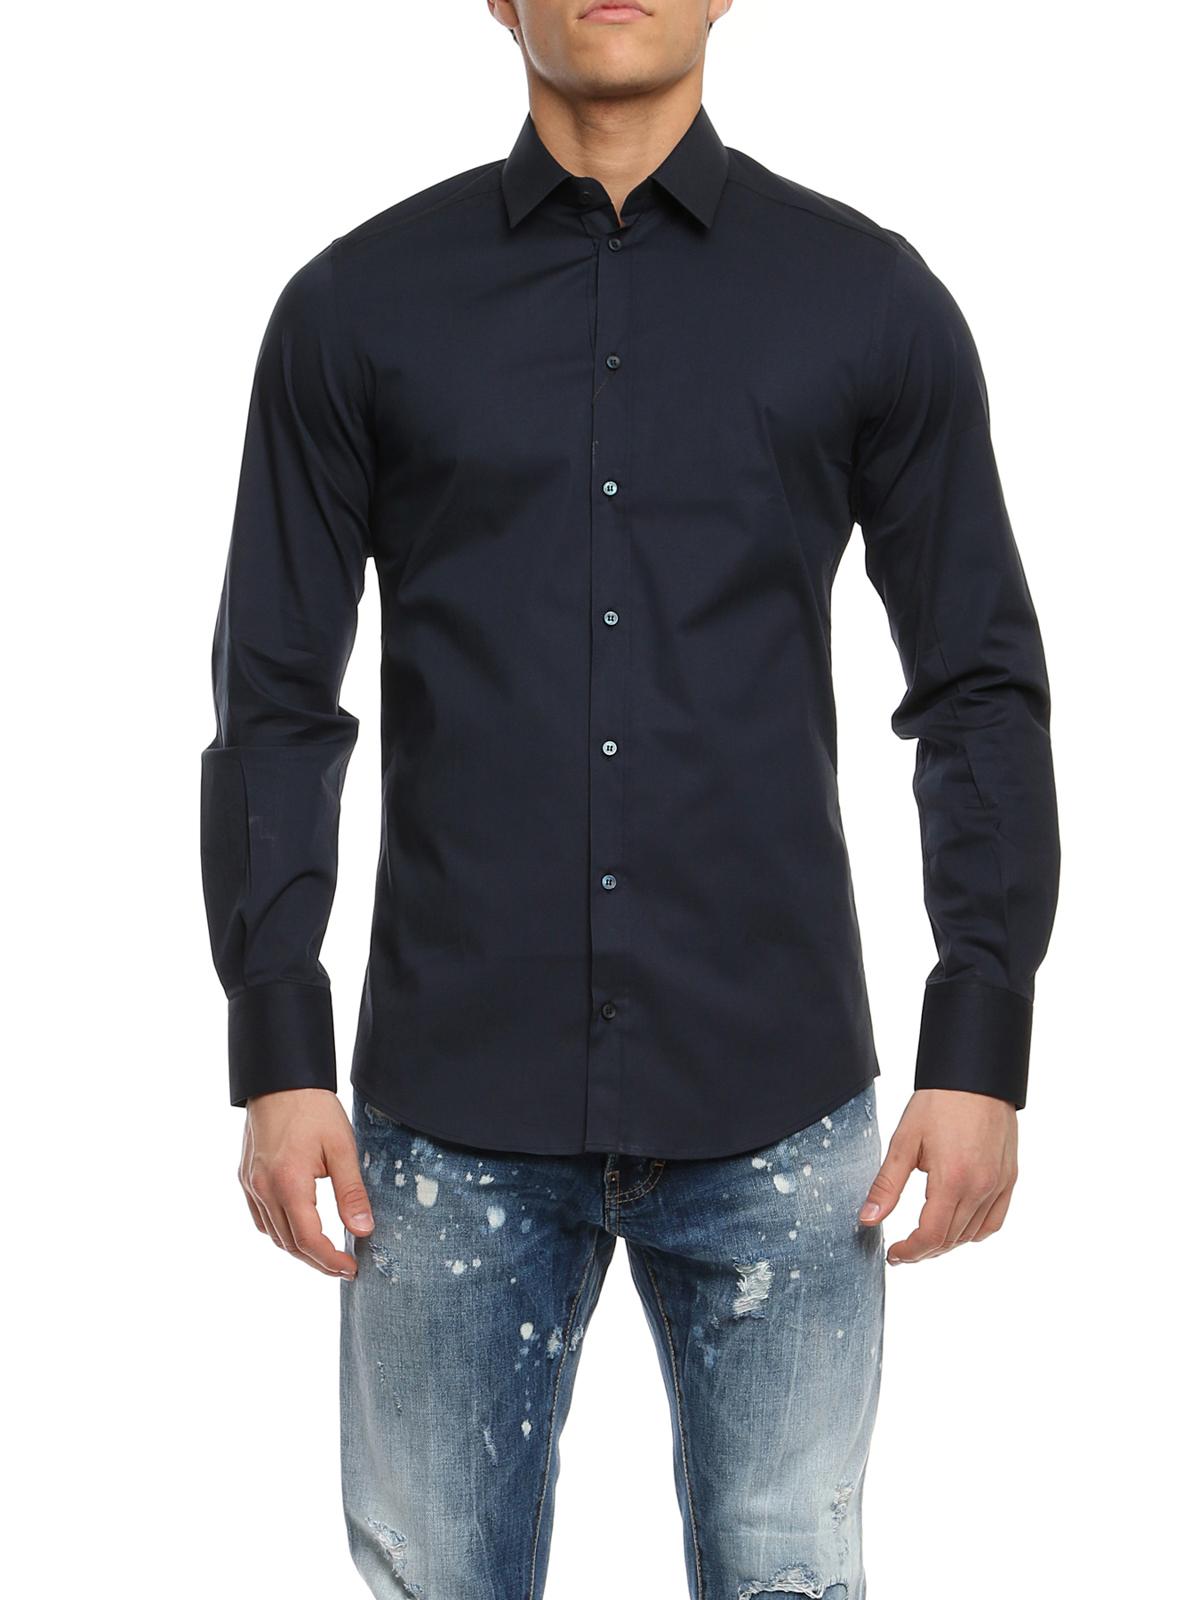 Sicily Fit Shirt By Dolce Gabbana Shirts Ikrix